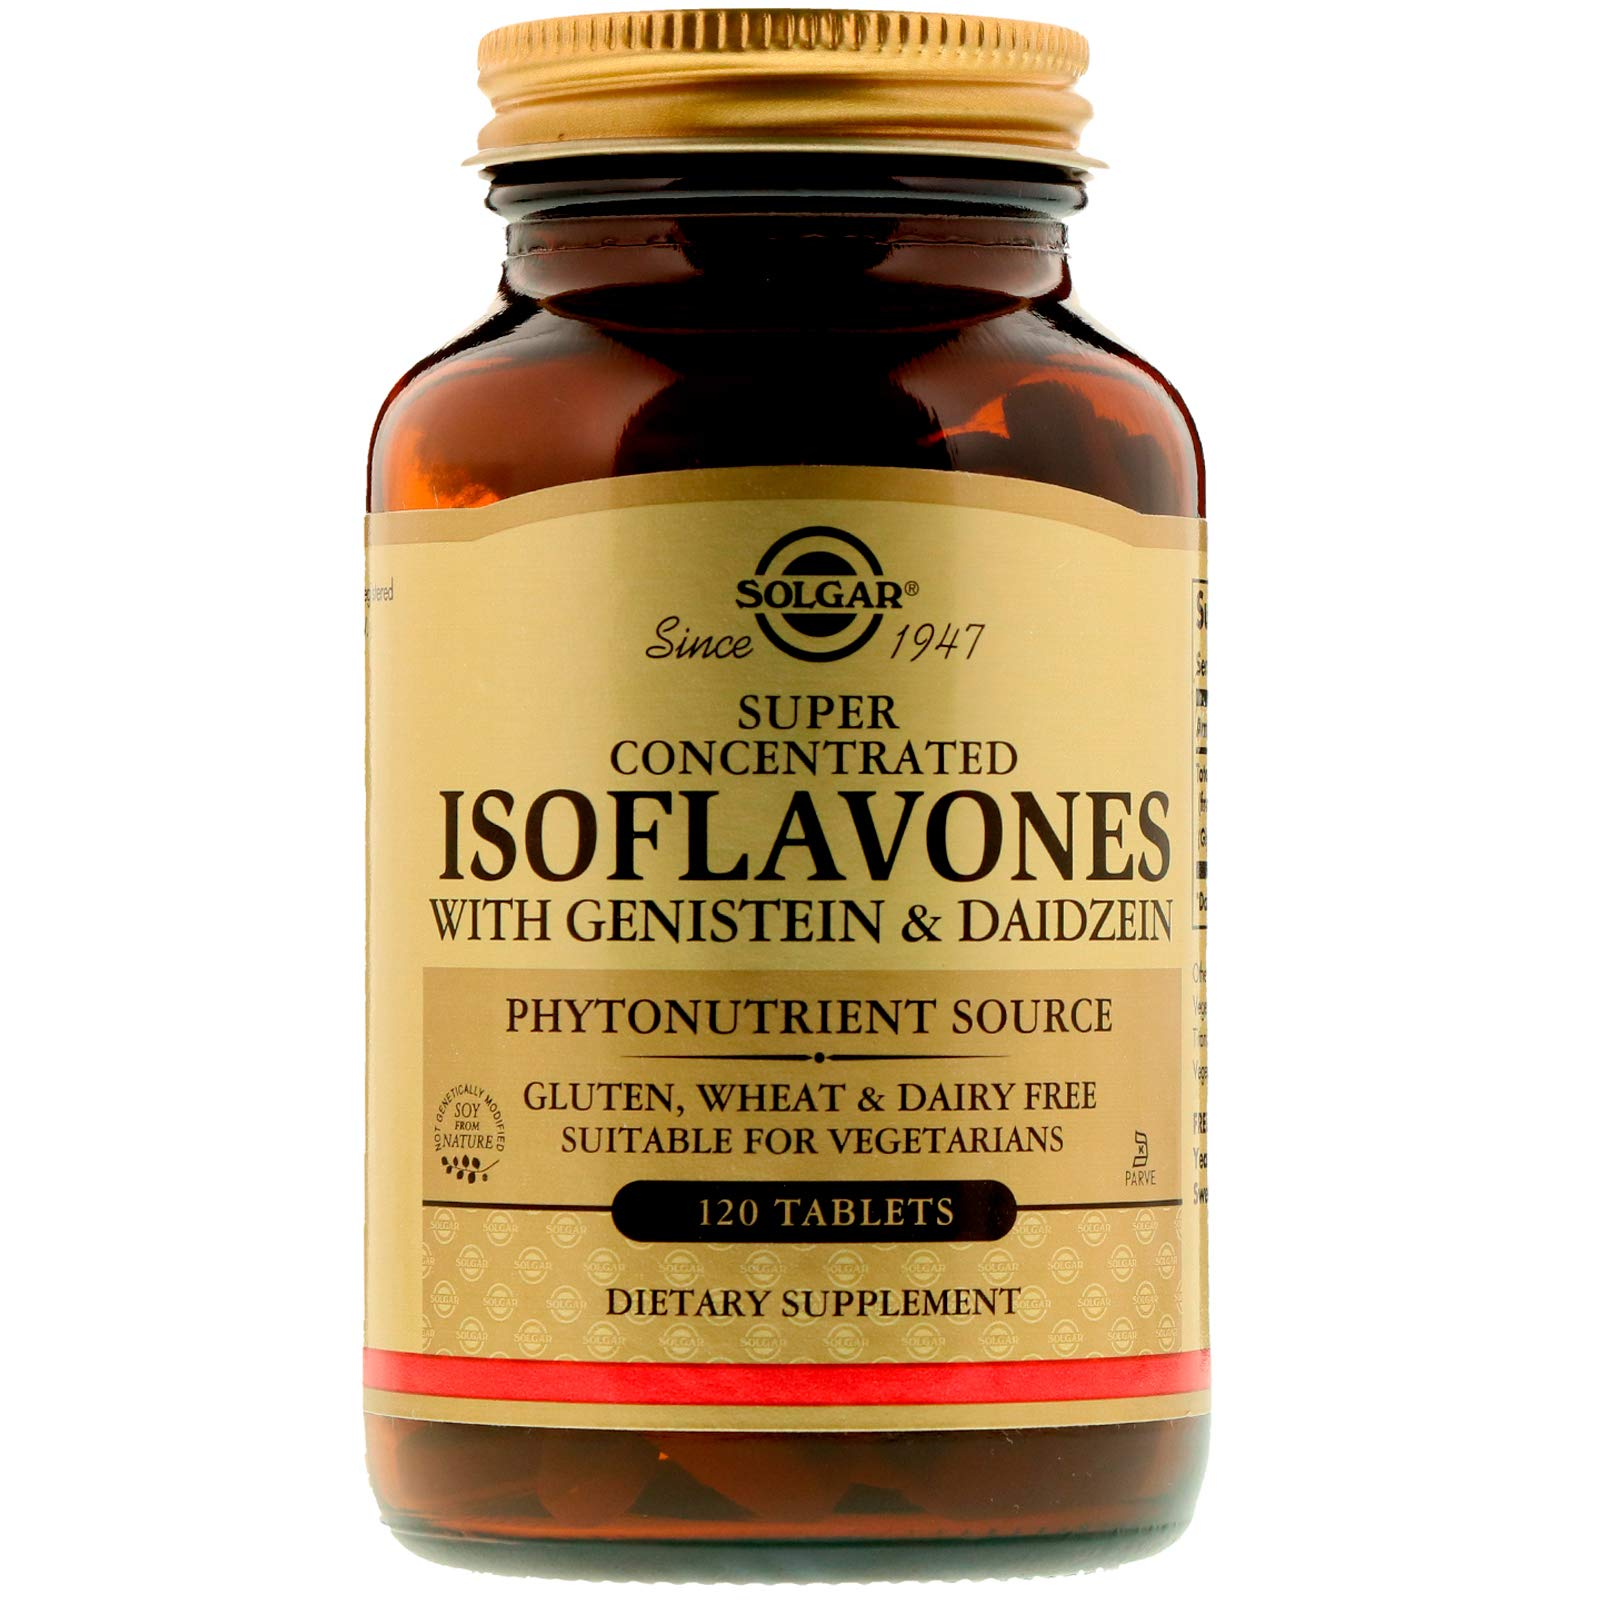 Solgar - Non-GMO Super Concentrated Isoflavones, 120 Tablets